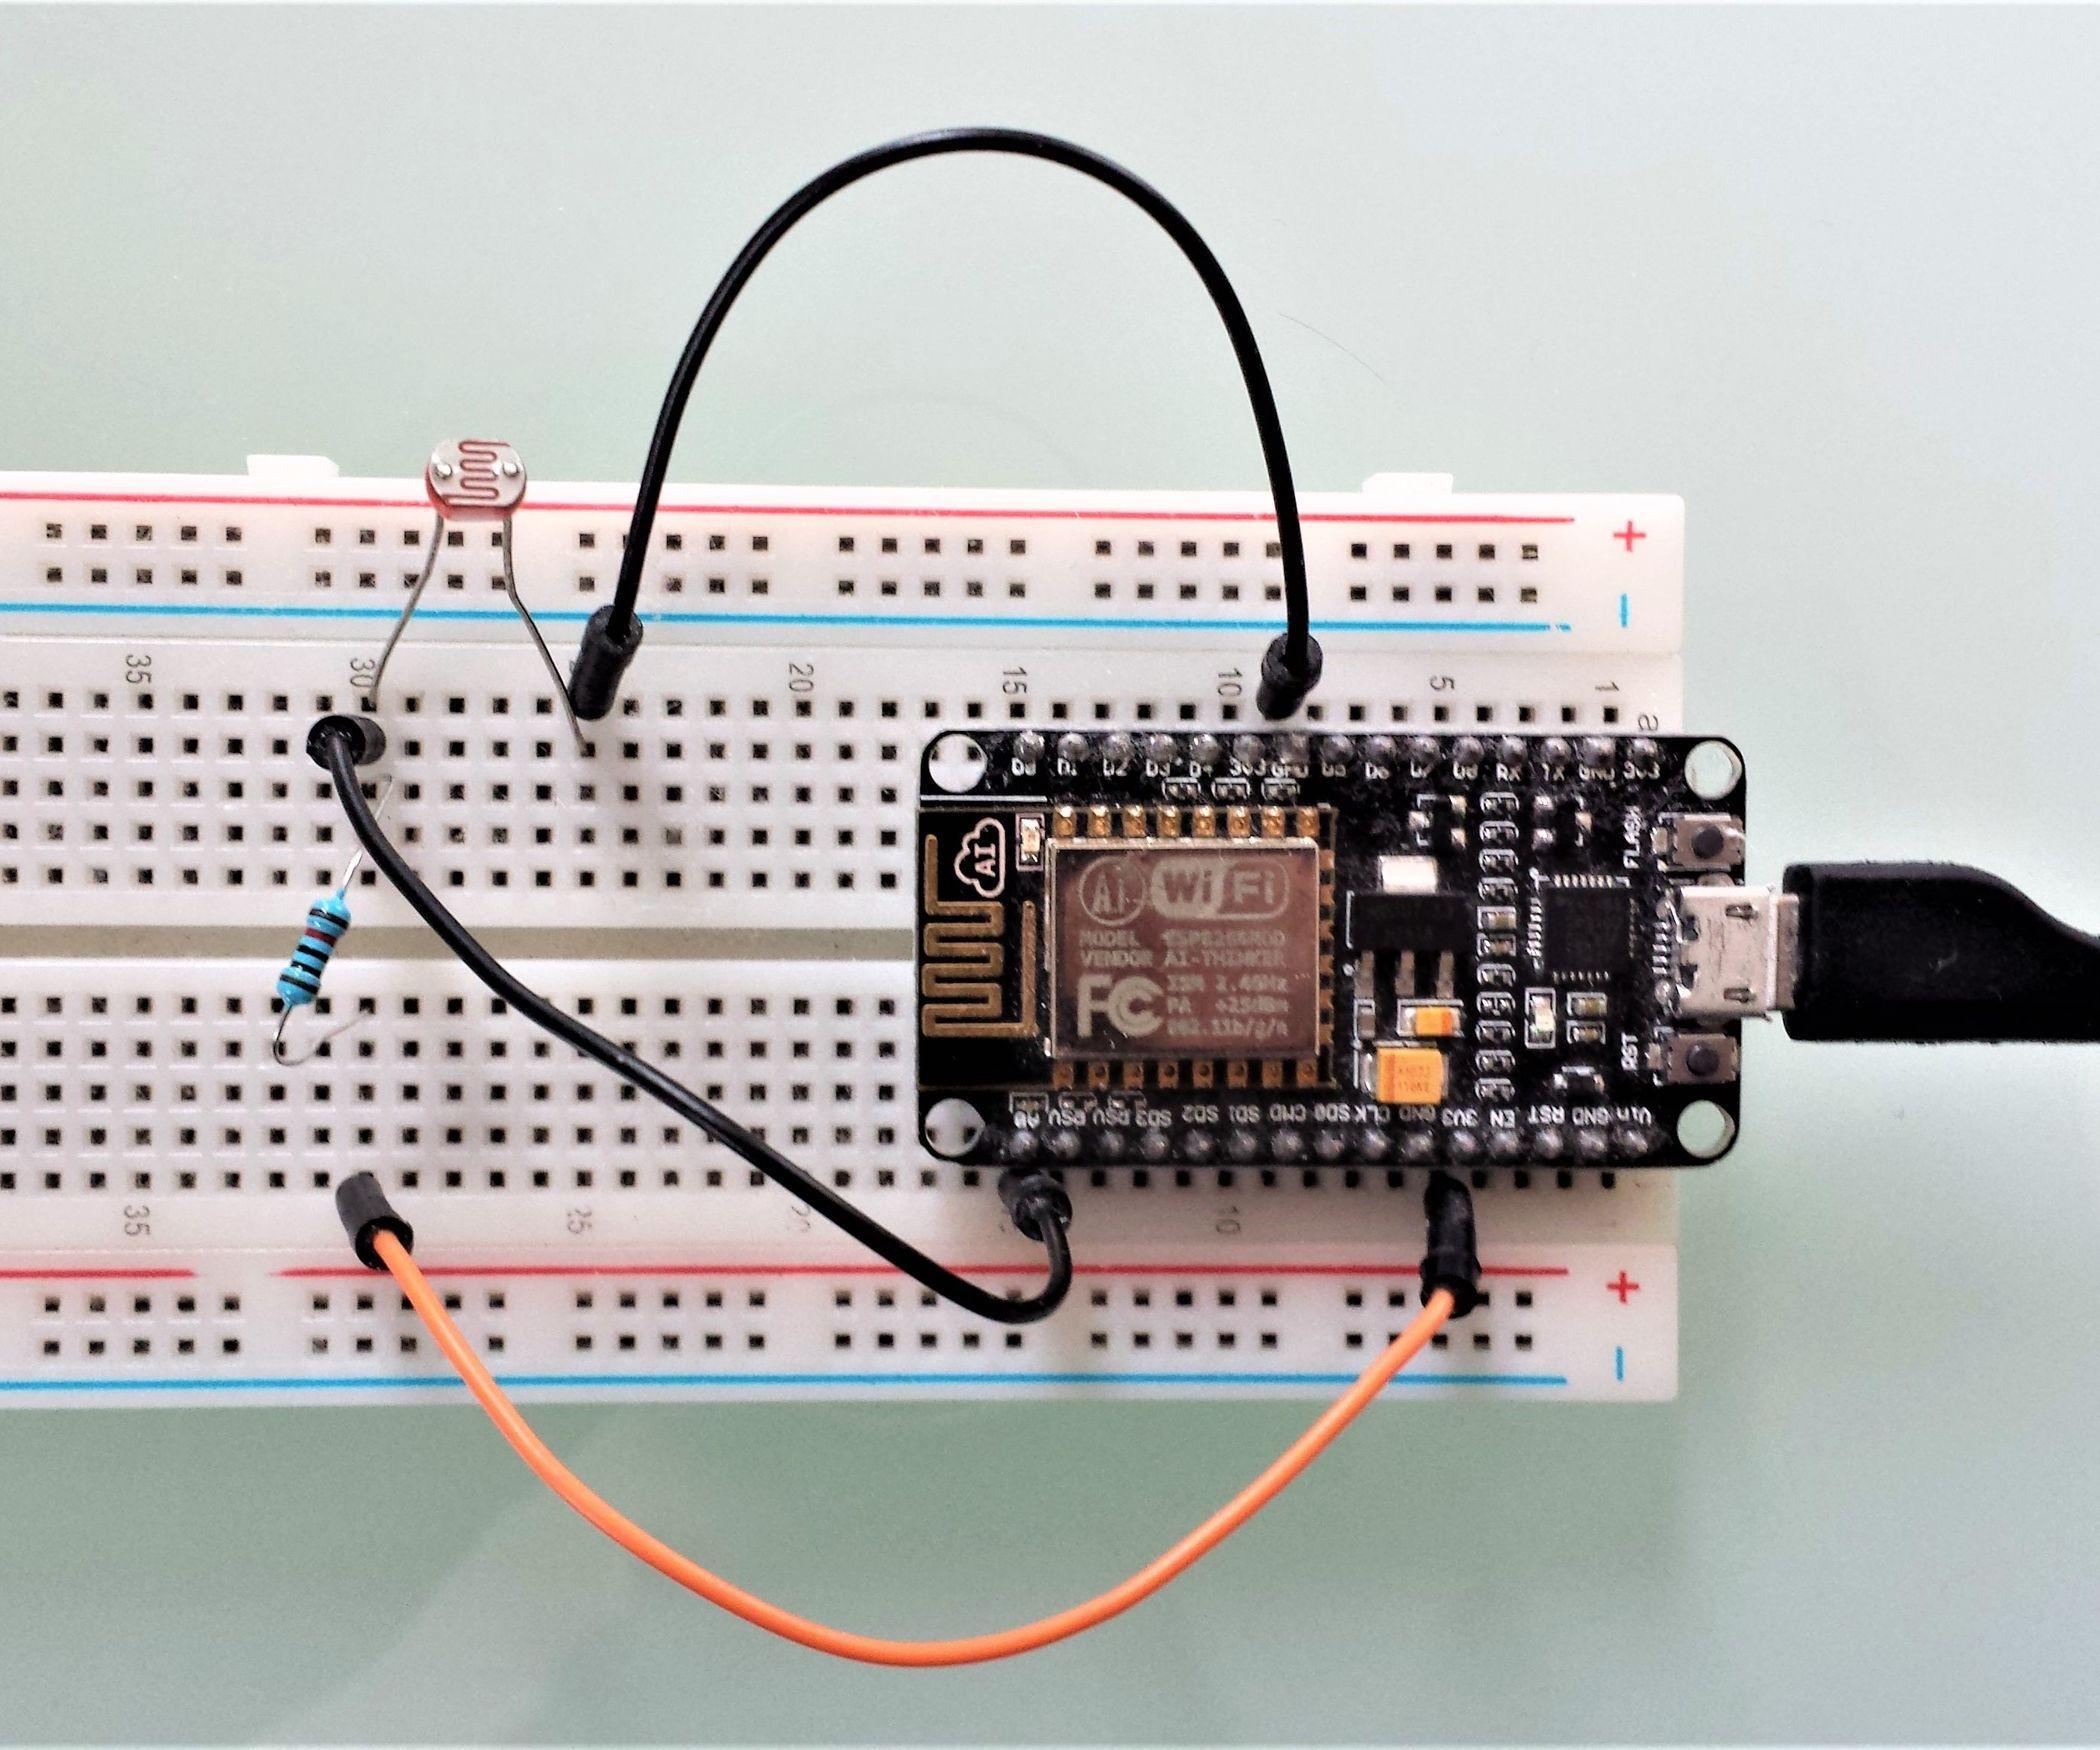 ESP8266 Light Sensor | Pinterest | Wifi, Arduino and Arduino projects